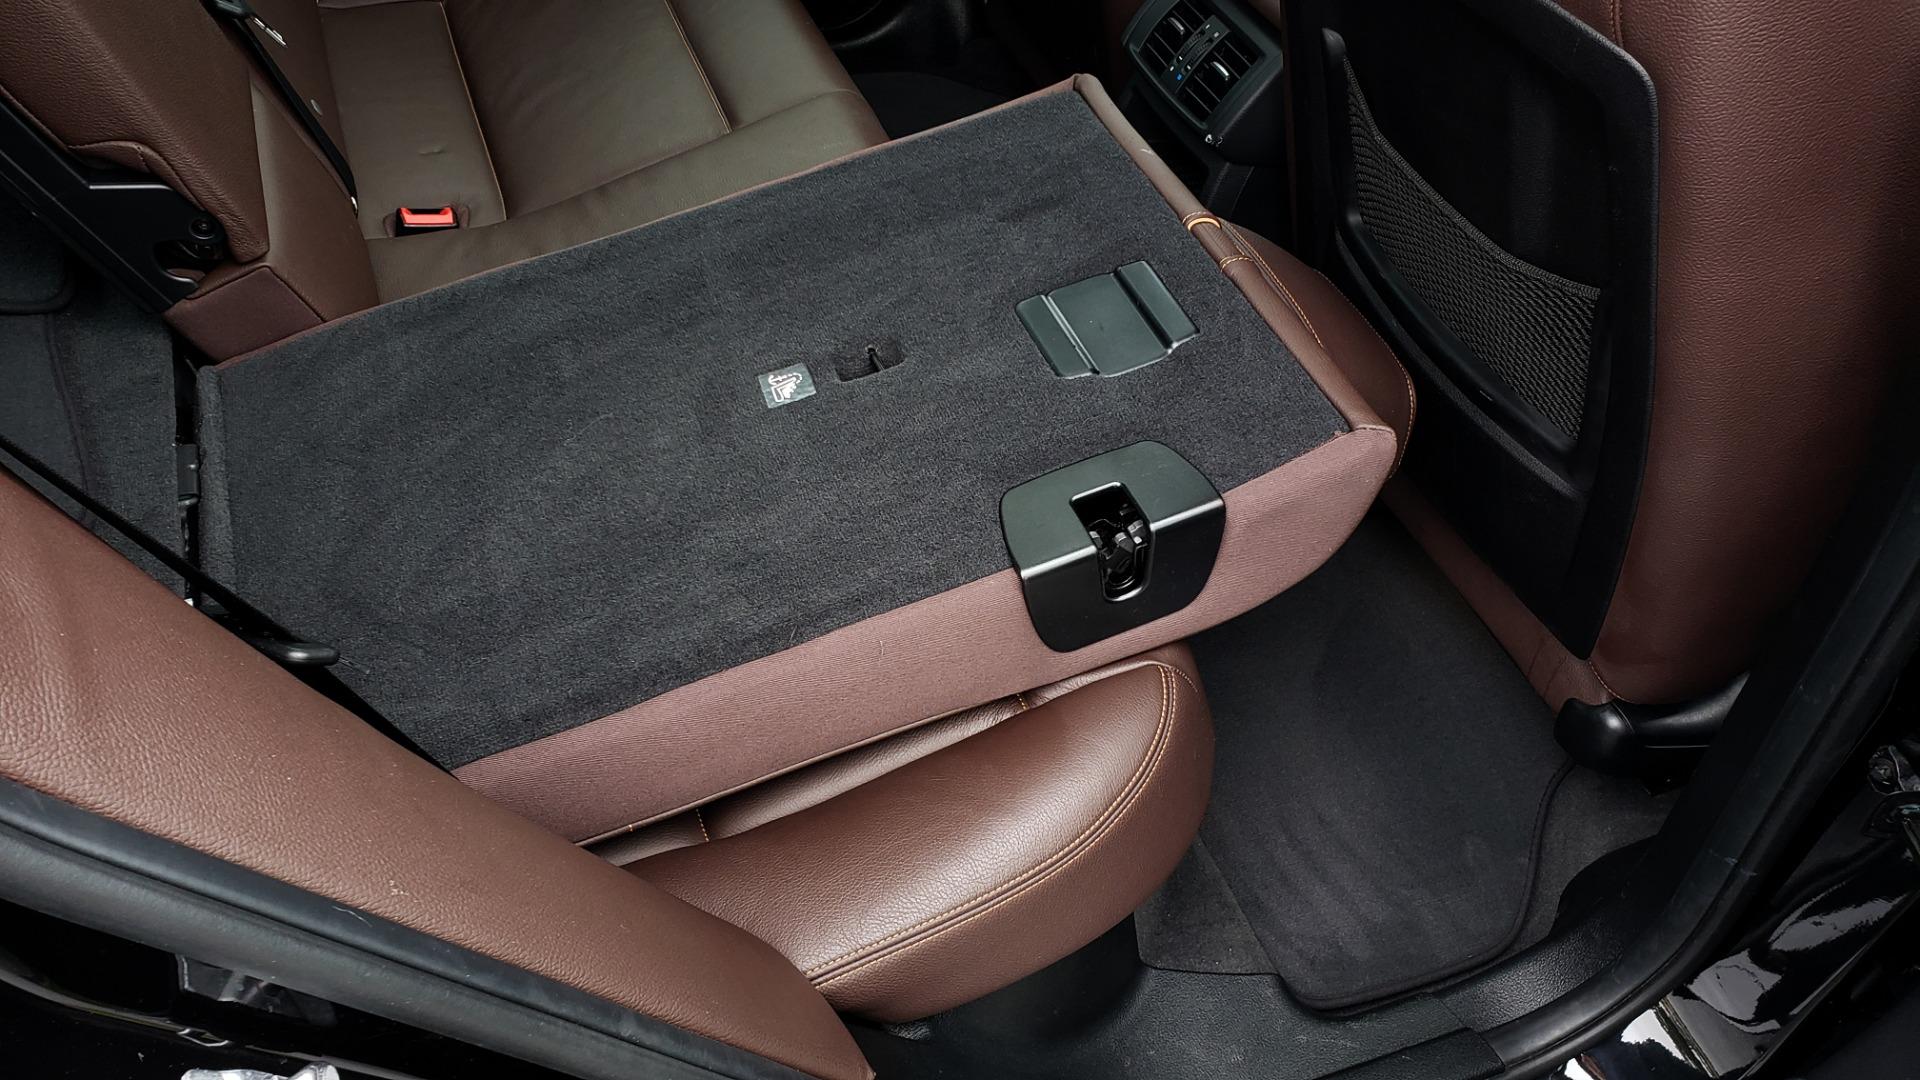 Used 2017 BMW X3 XDRIVE35I M-SPORT / DRVR ASST PLUS / TECHNOLOGY / HUD / BLIND SPOT for sale Sold at Formula Imports in Charlotte NC 28227 70